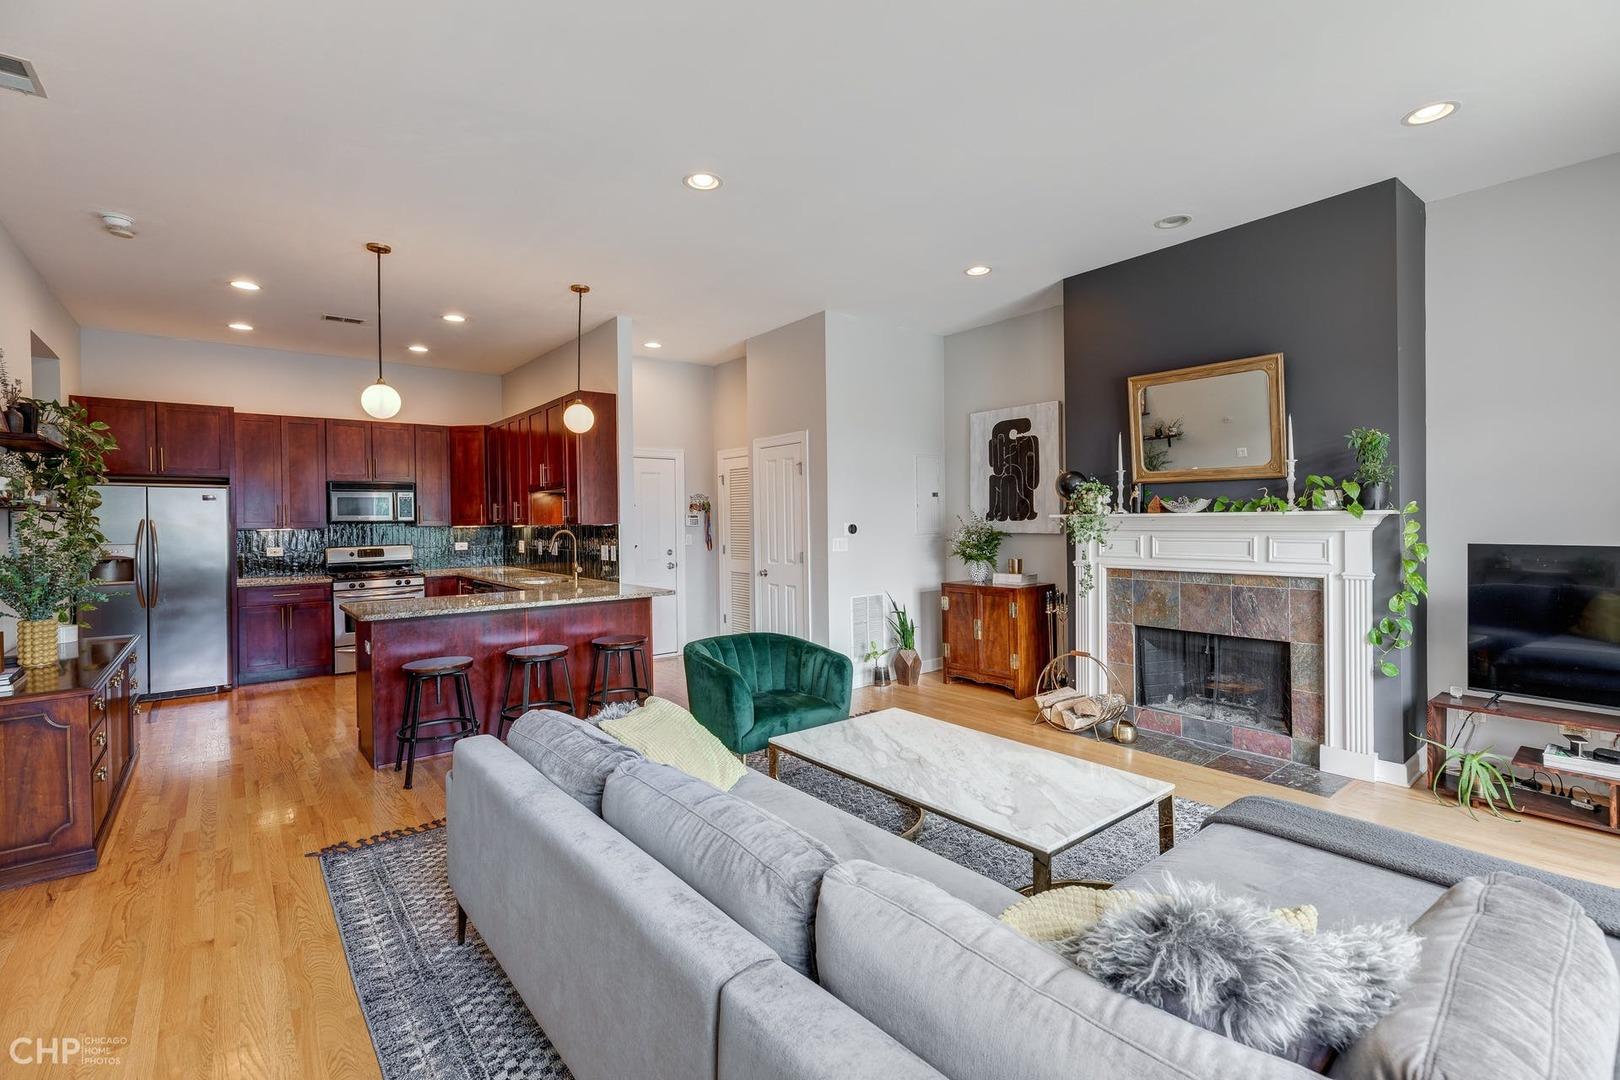 4603 Racine Avenue, Chicago, Illinois 60640, 2 Bedrooms Bedrooms, ,2 BathroomsBathrooms,Residential,For Sale,Racine,MRD11180764